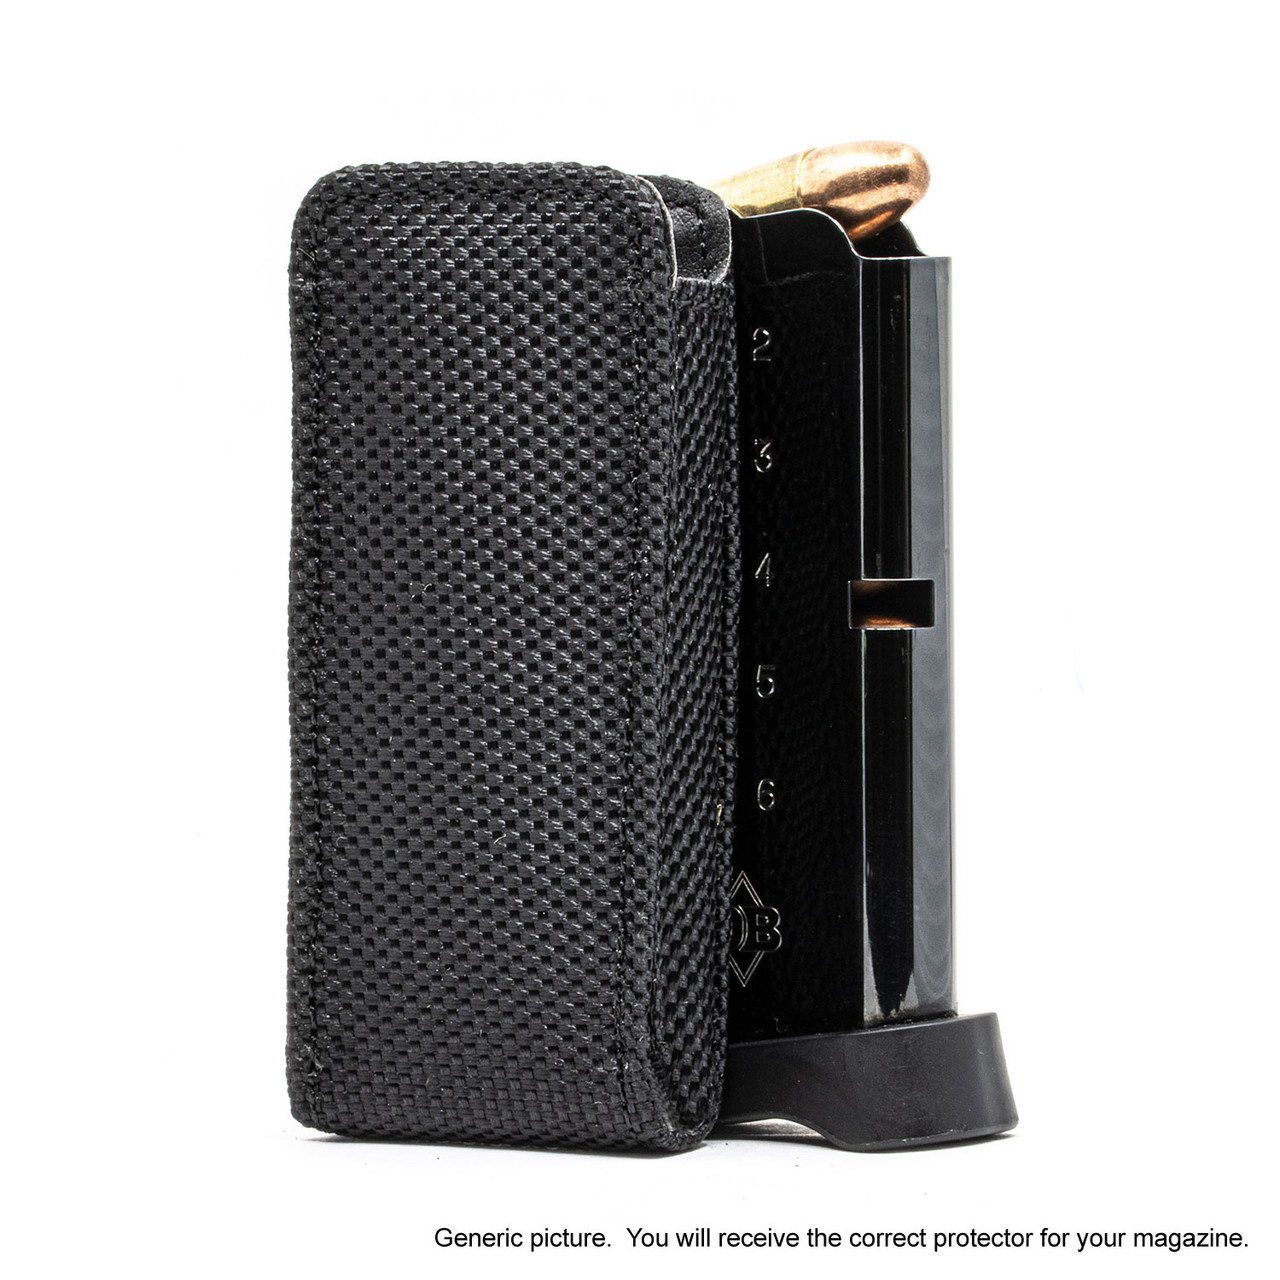 Colt Mark IV Series 80 (.380) Black Ballistic Nylon Magazine Pocket Protector